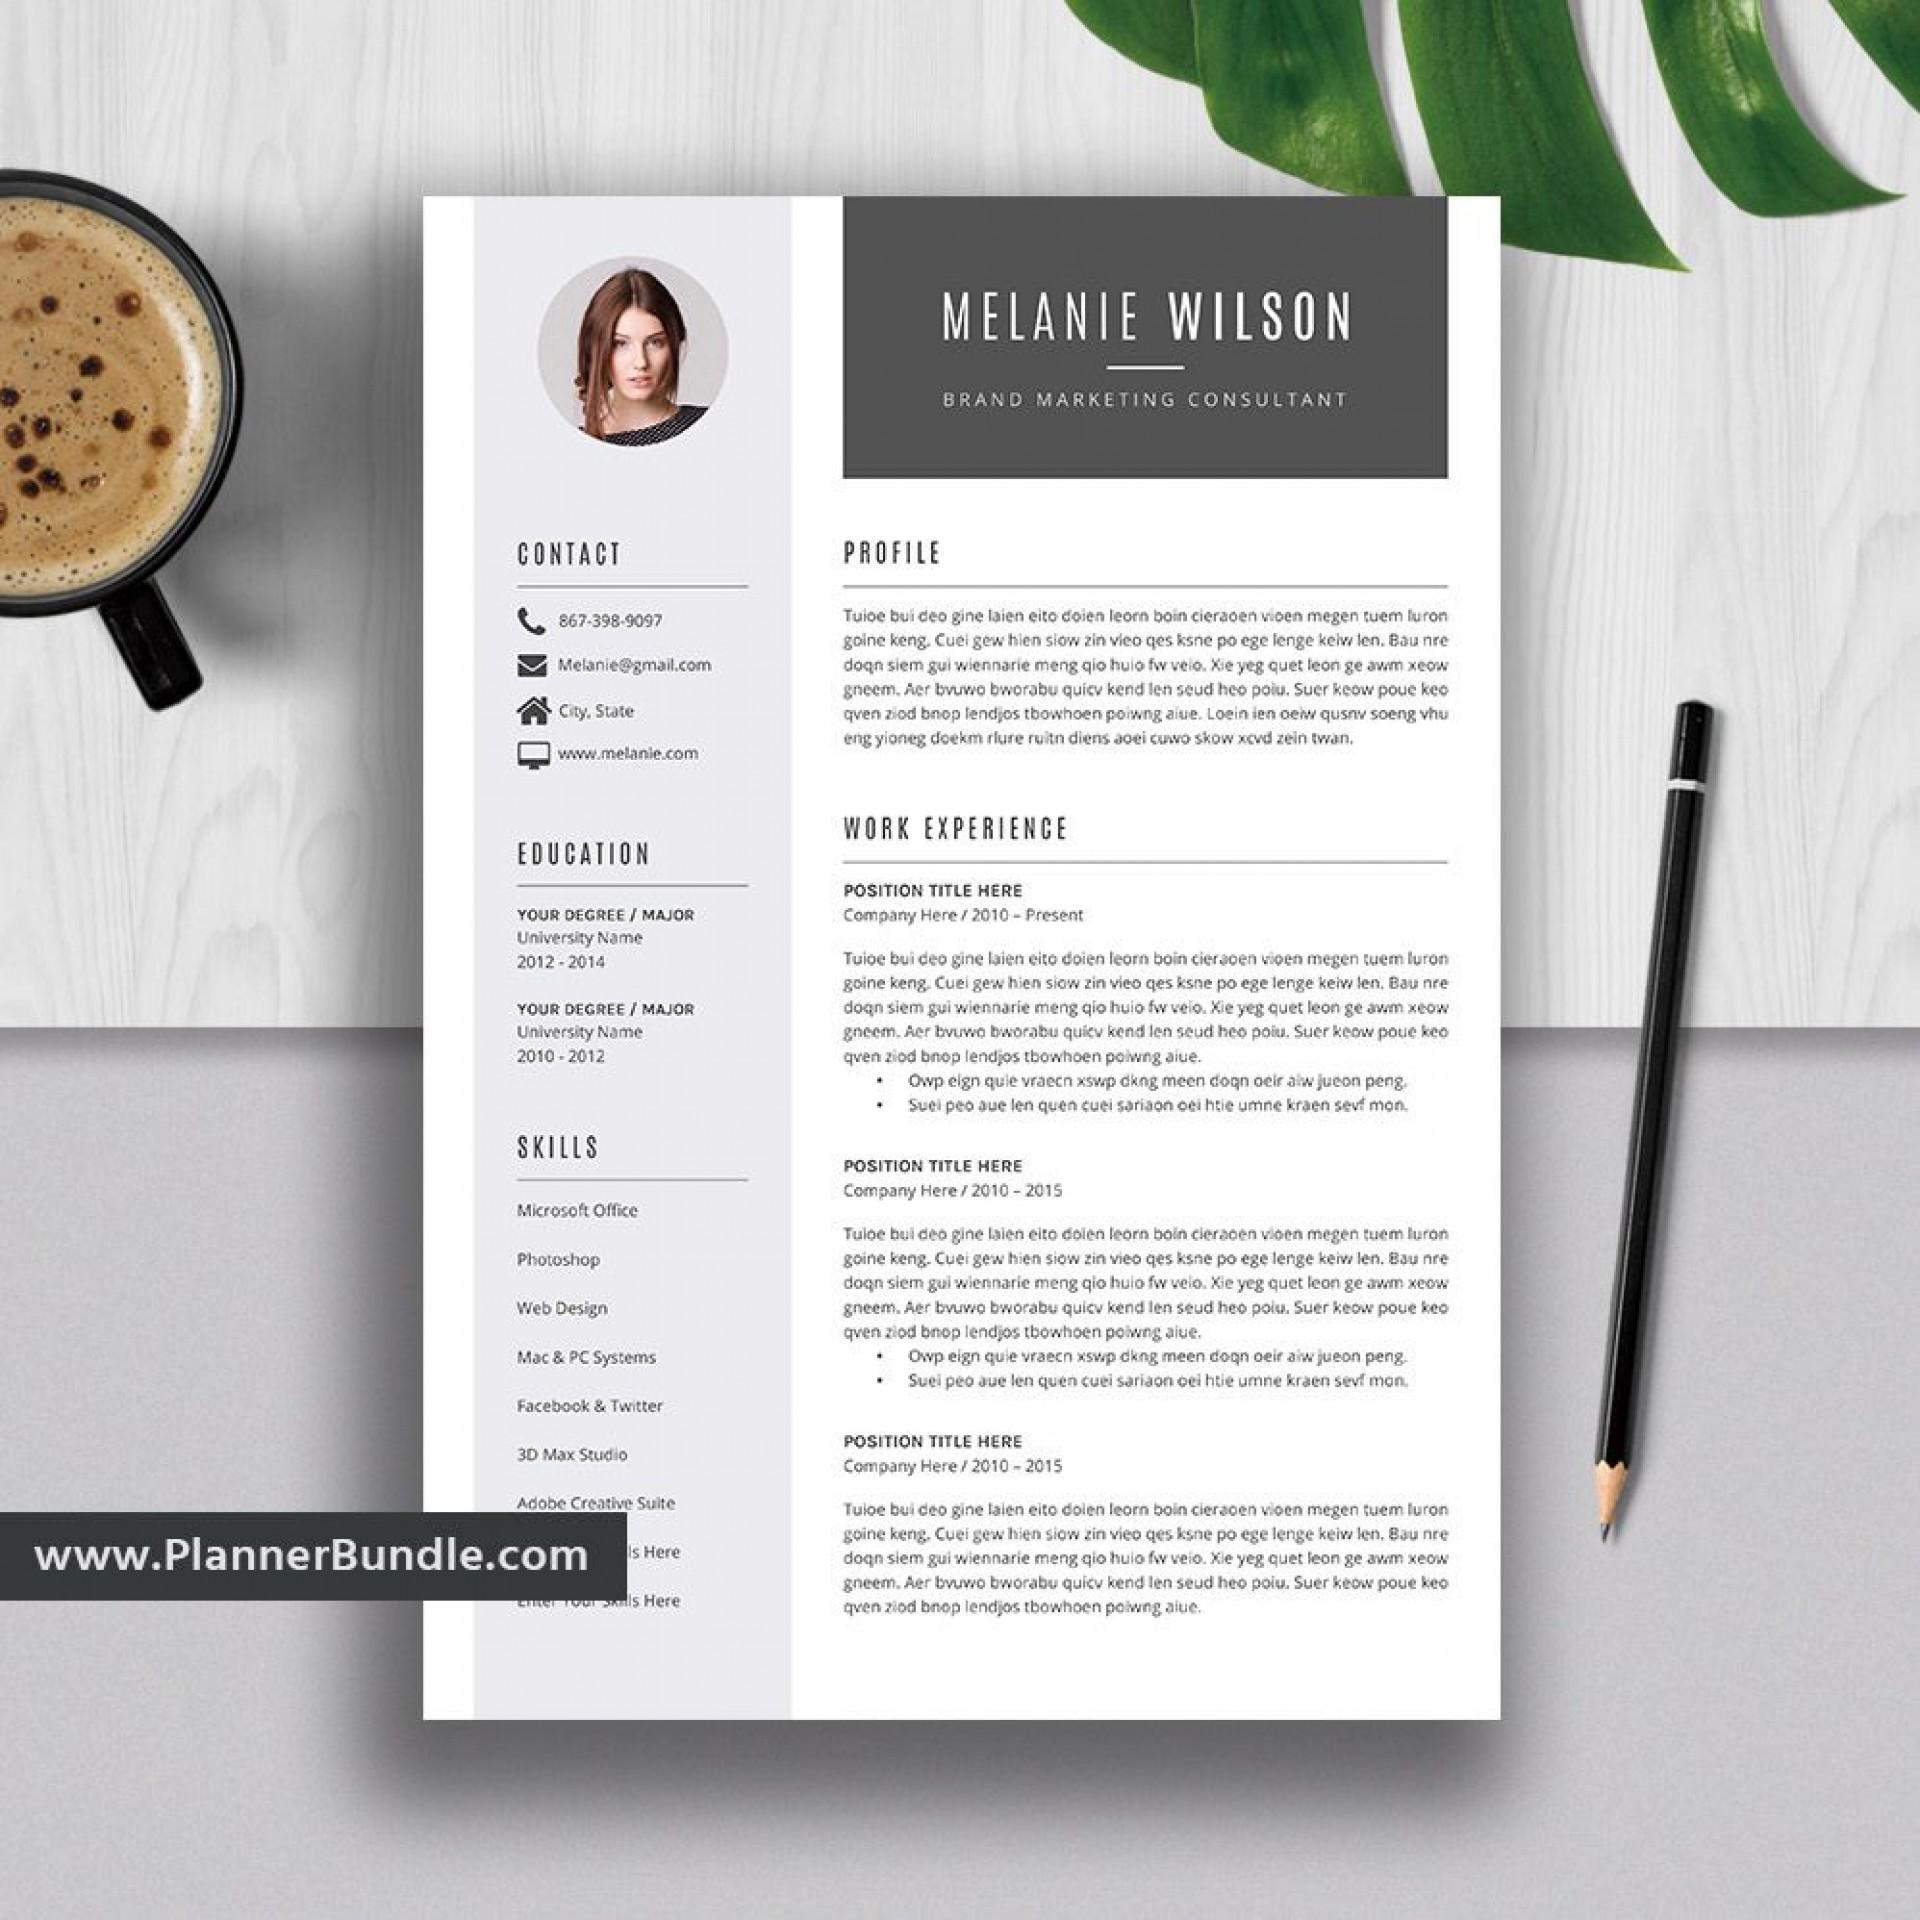 007 Stunning Word Resume Template 2020 Photo  Microsoft M1920